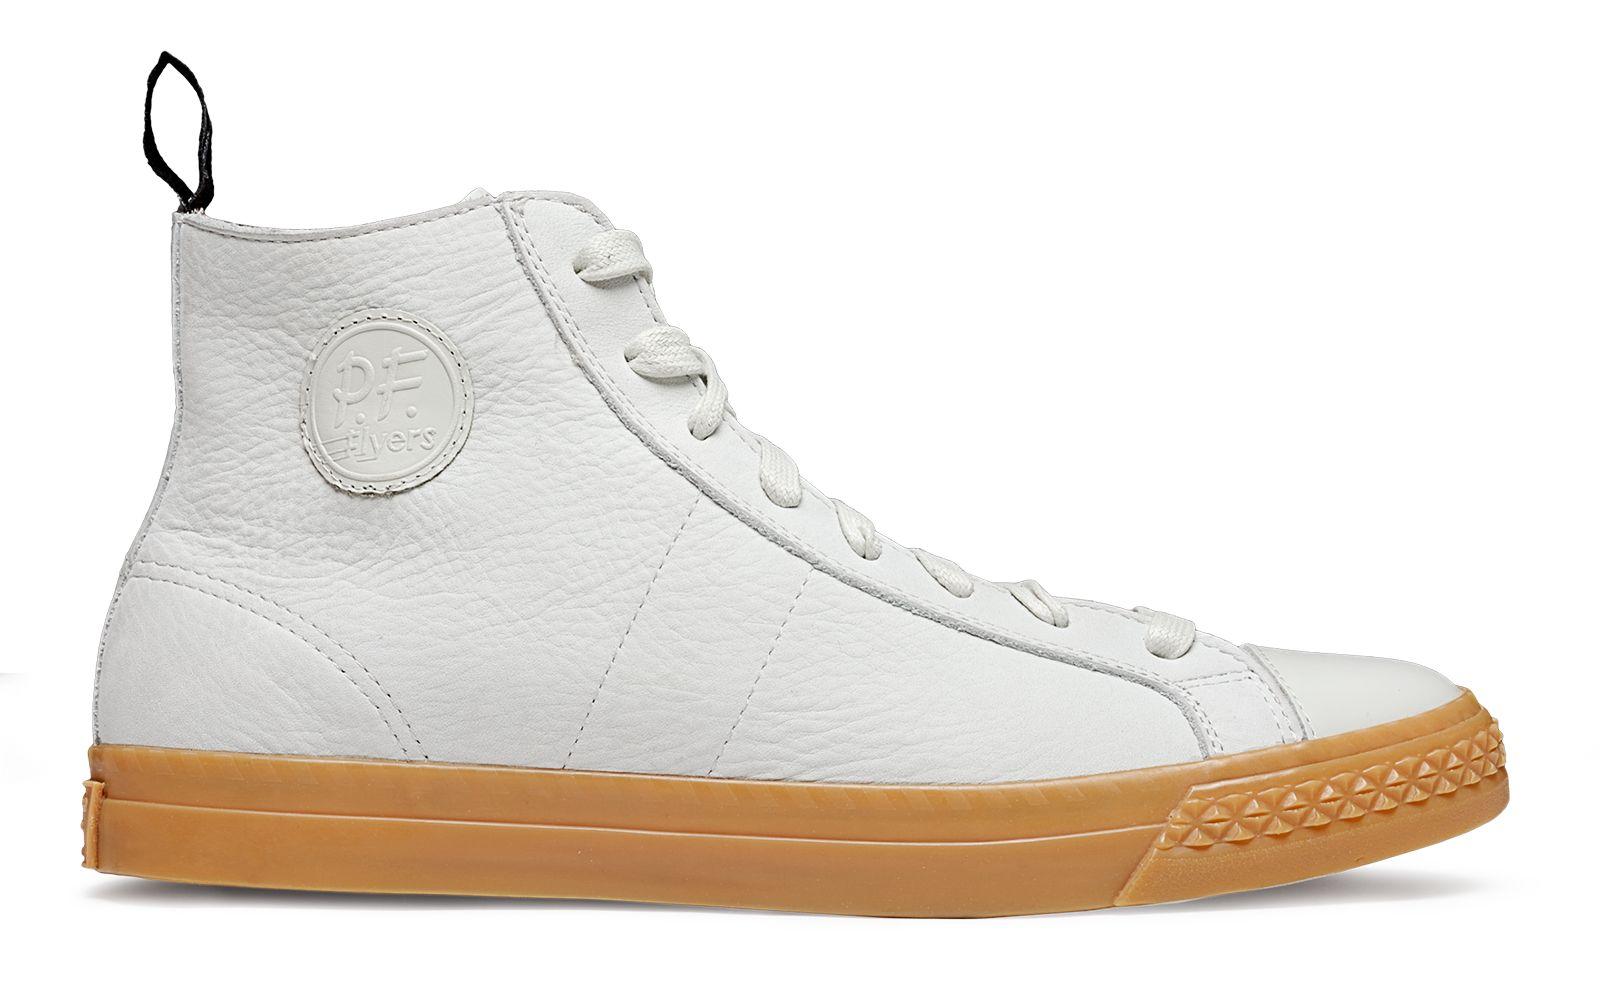 Todd Snyder Rambler Hi Shoes